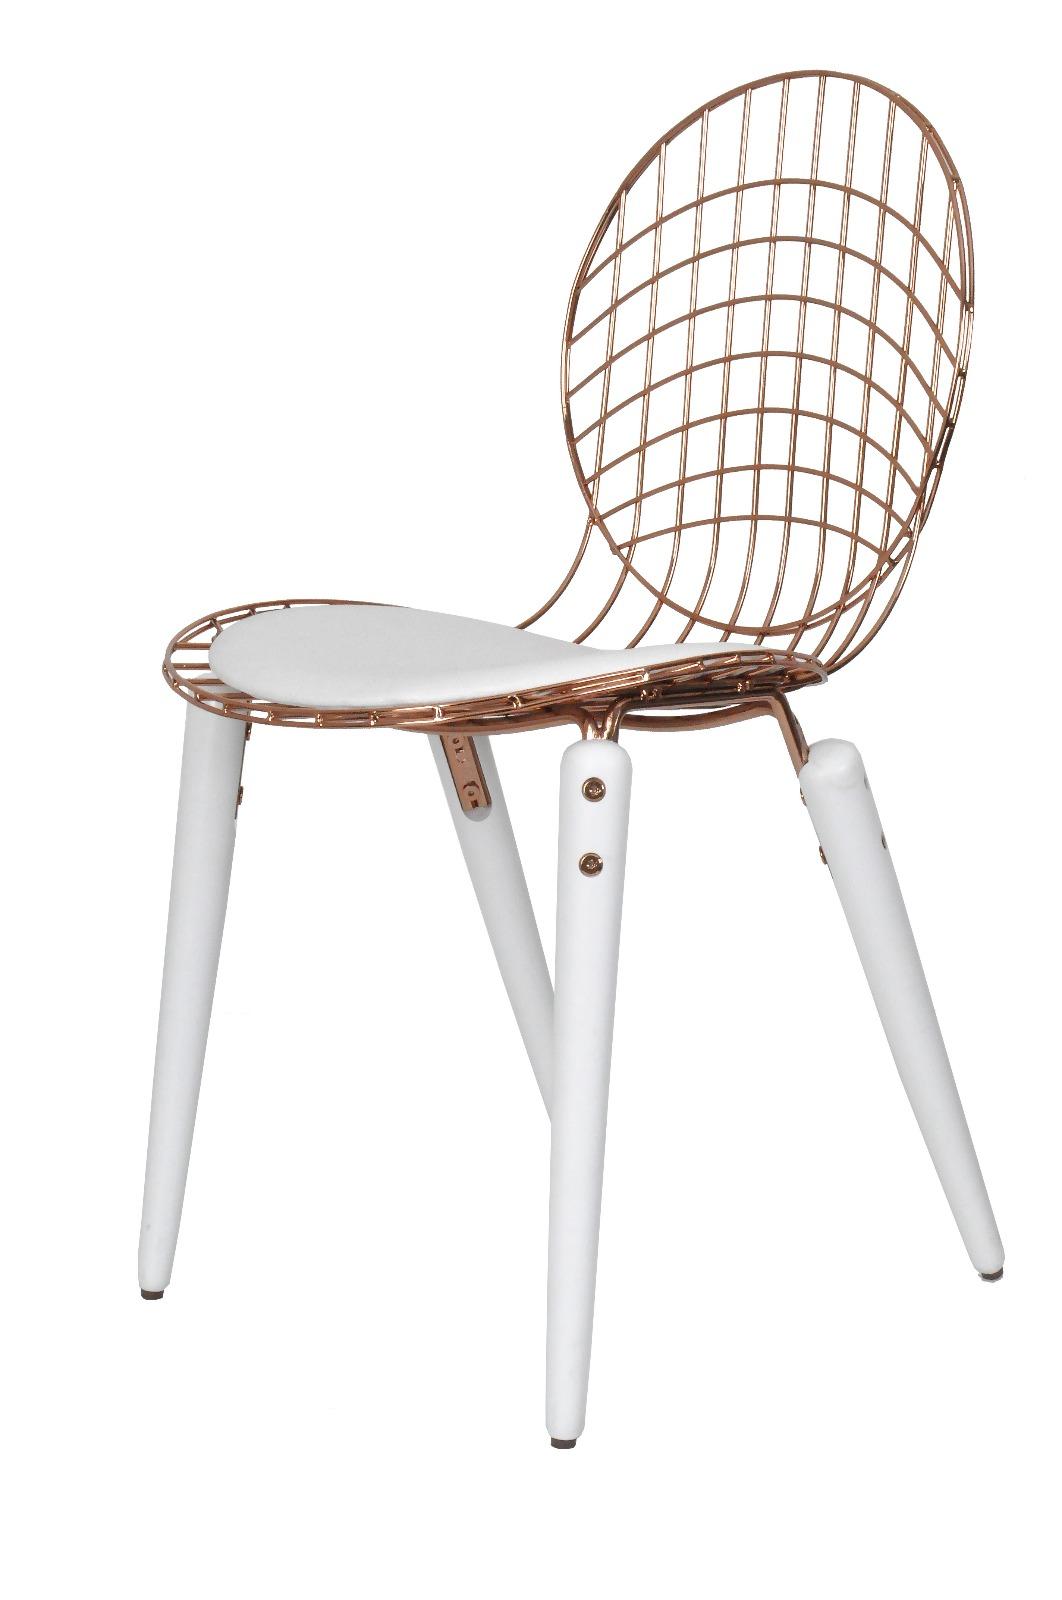 Almila Stuhl Bella Weiß Rosé in trendigem Design